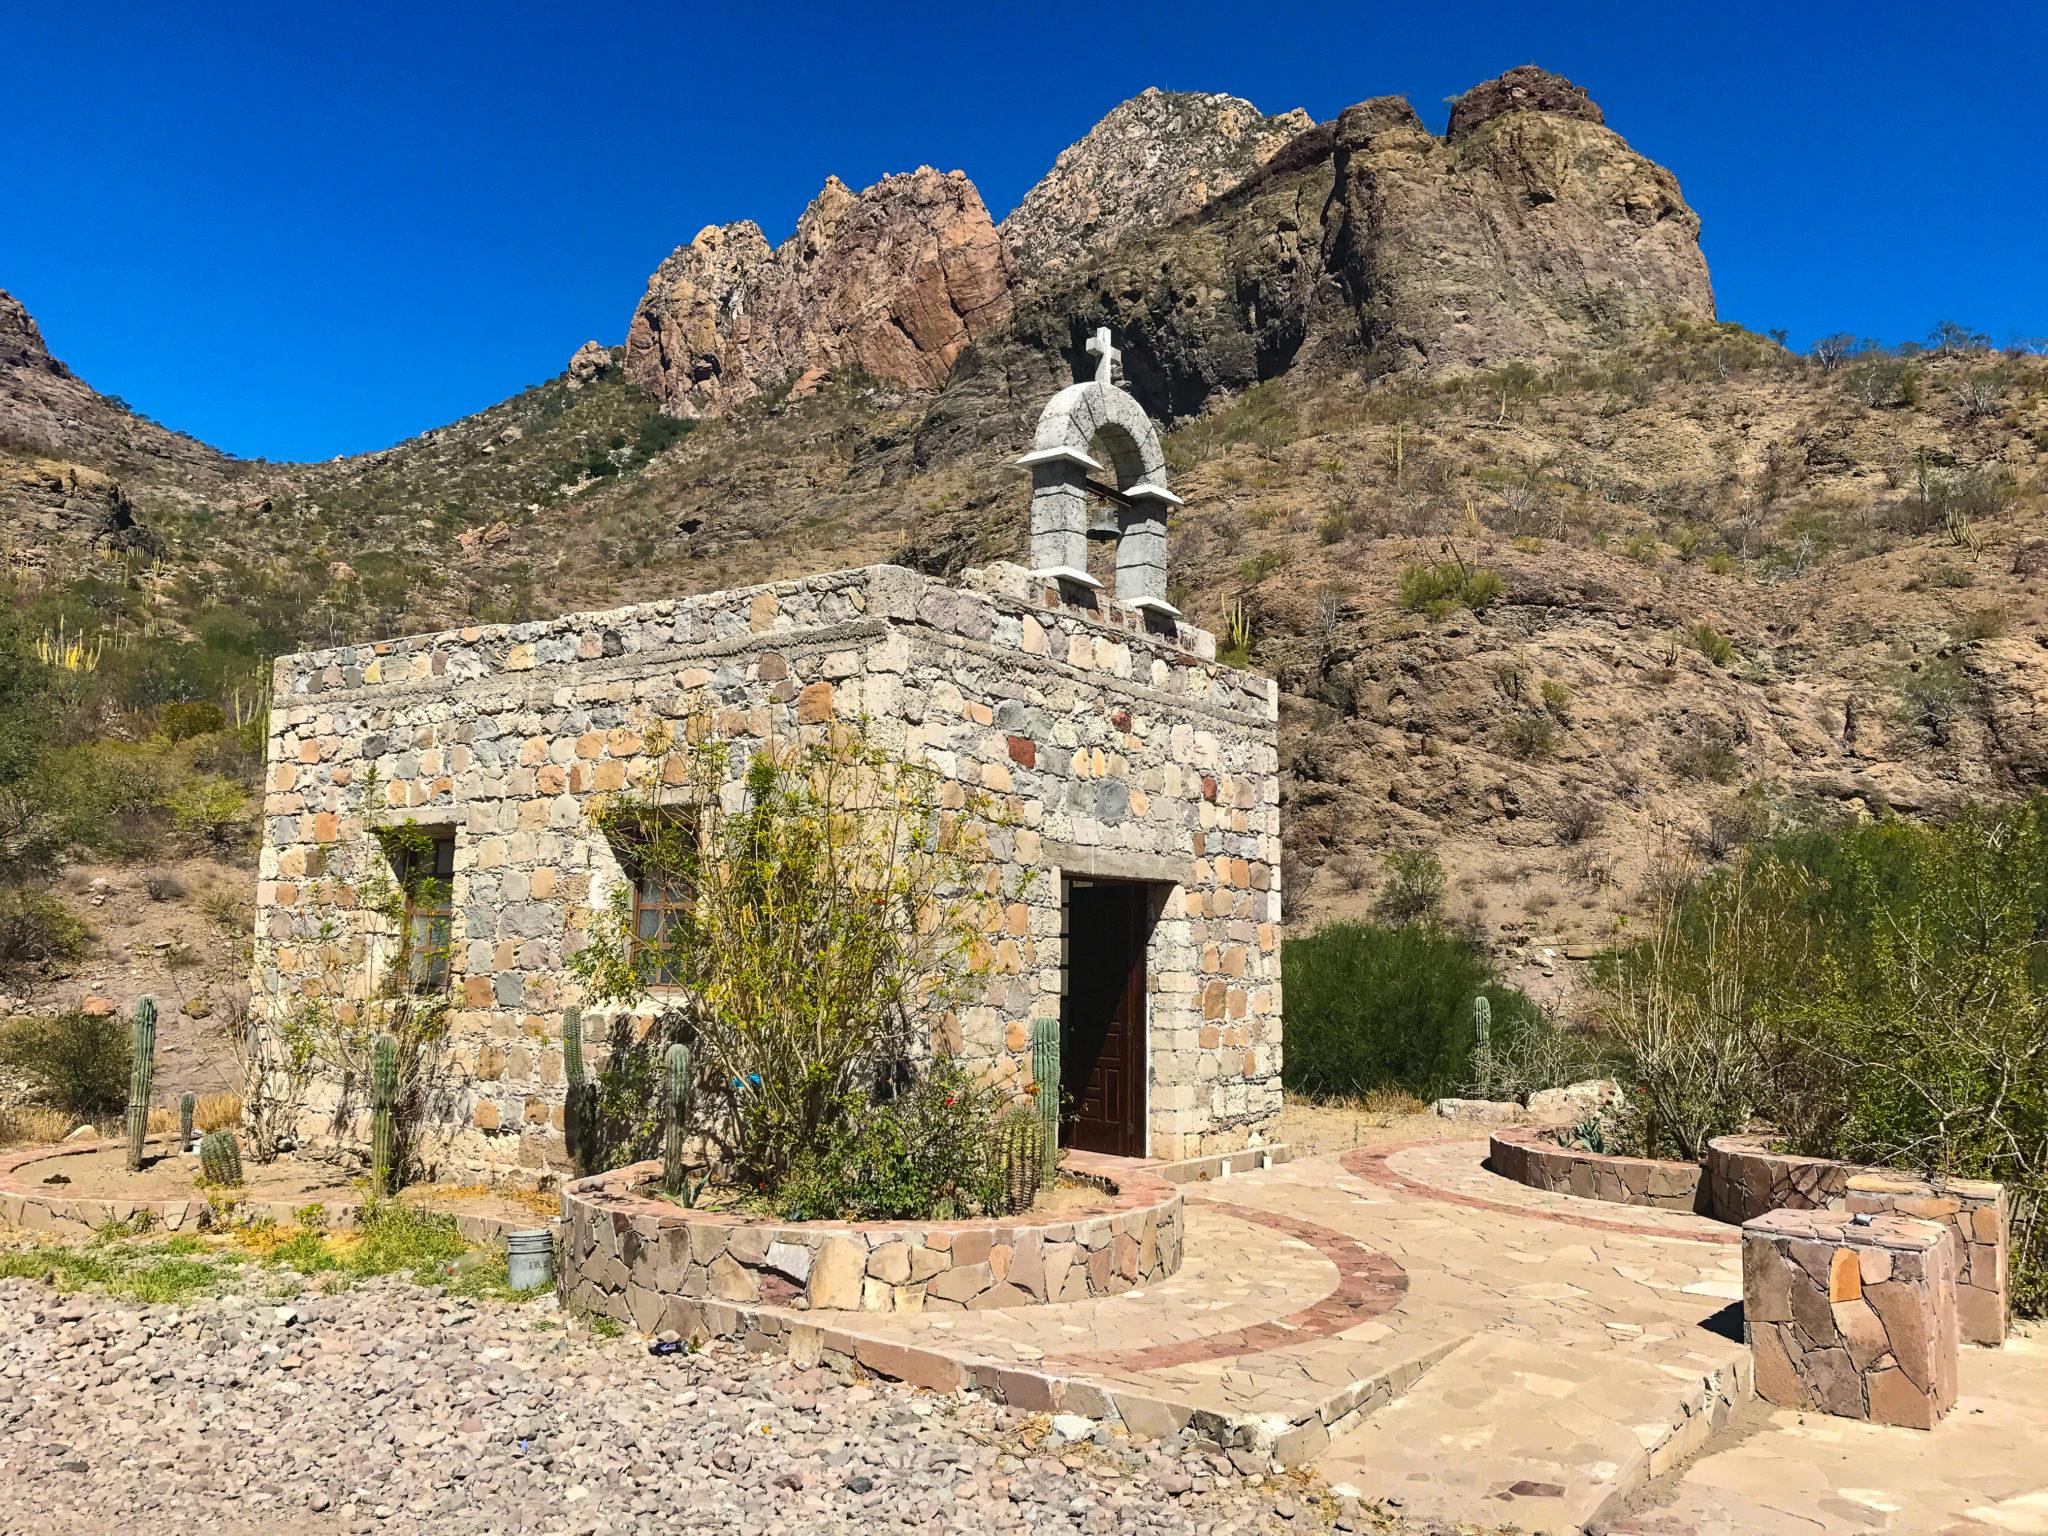 Camino a San Javier, Baja California Sur, México.